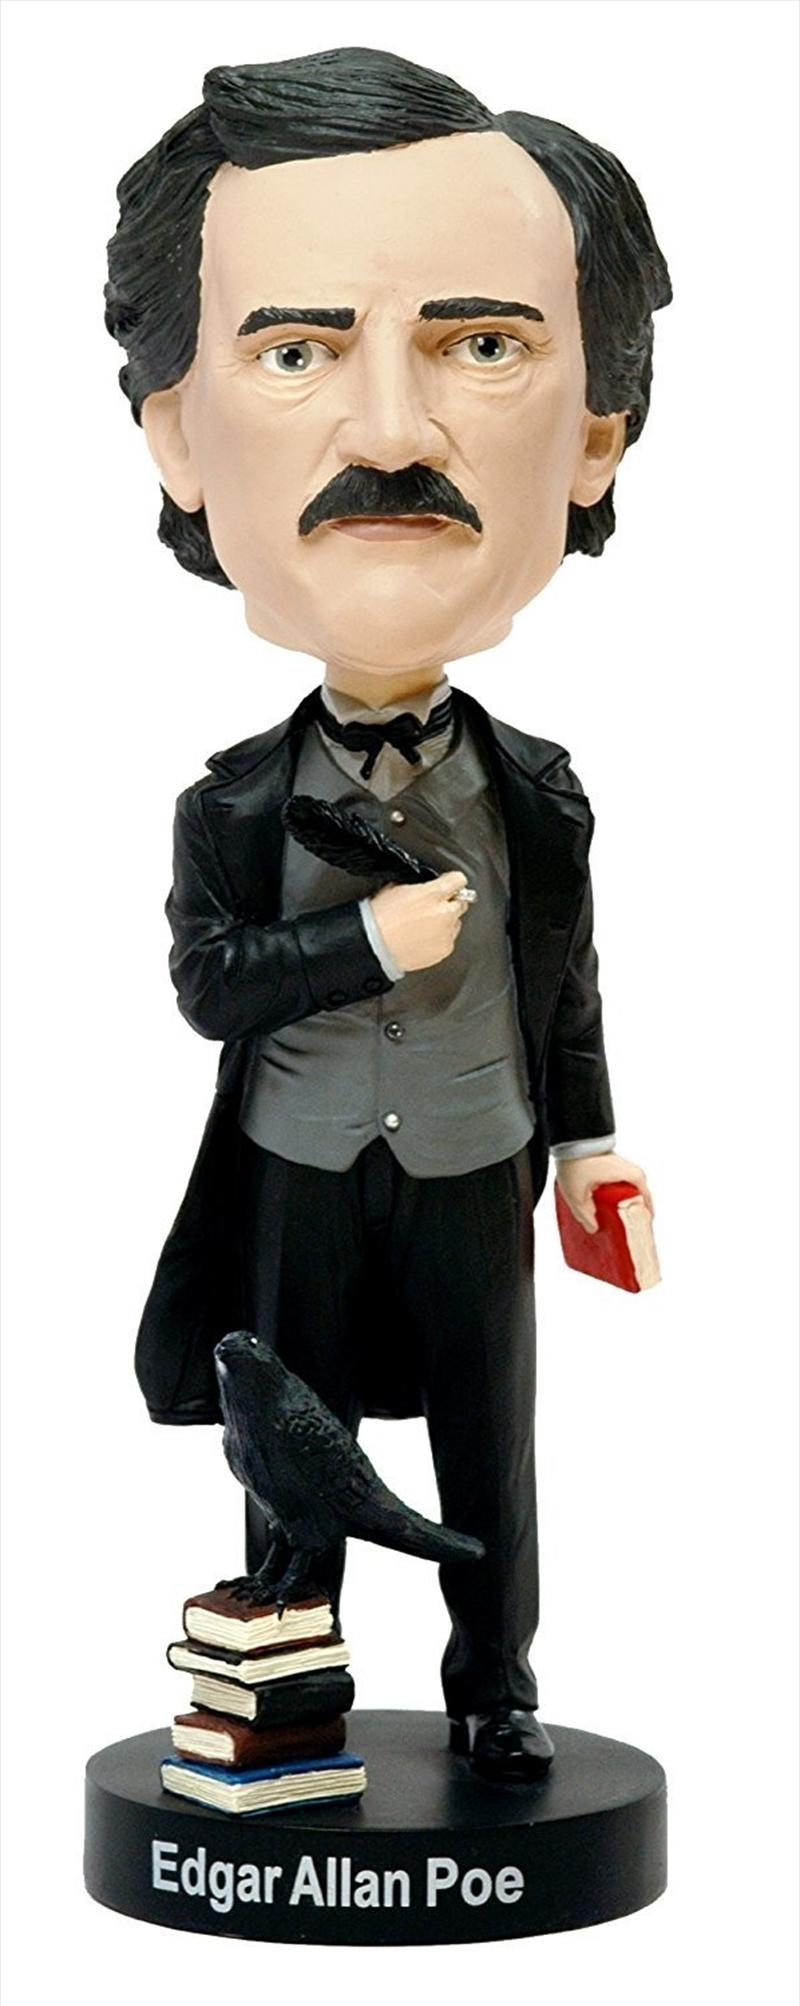 Edgar Allan Poe 8 Inch | Merchandise